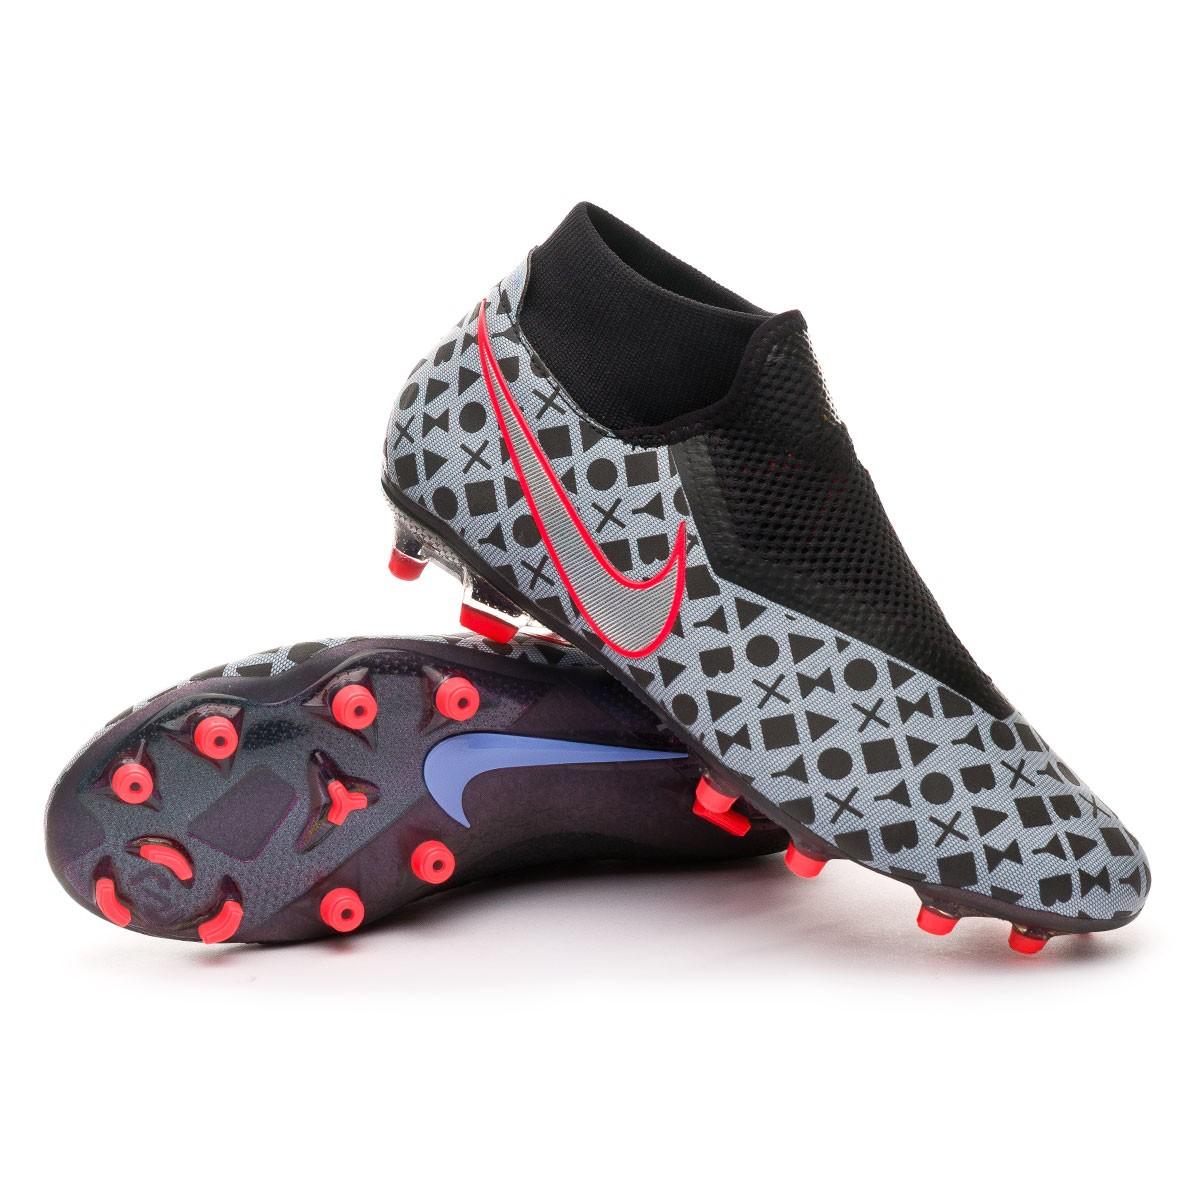 c37716555 Football Boots Nike Phantom Vision Academy DF MG EA Sports White ...